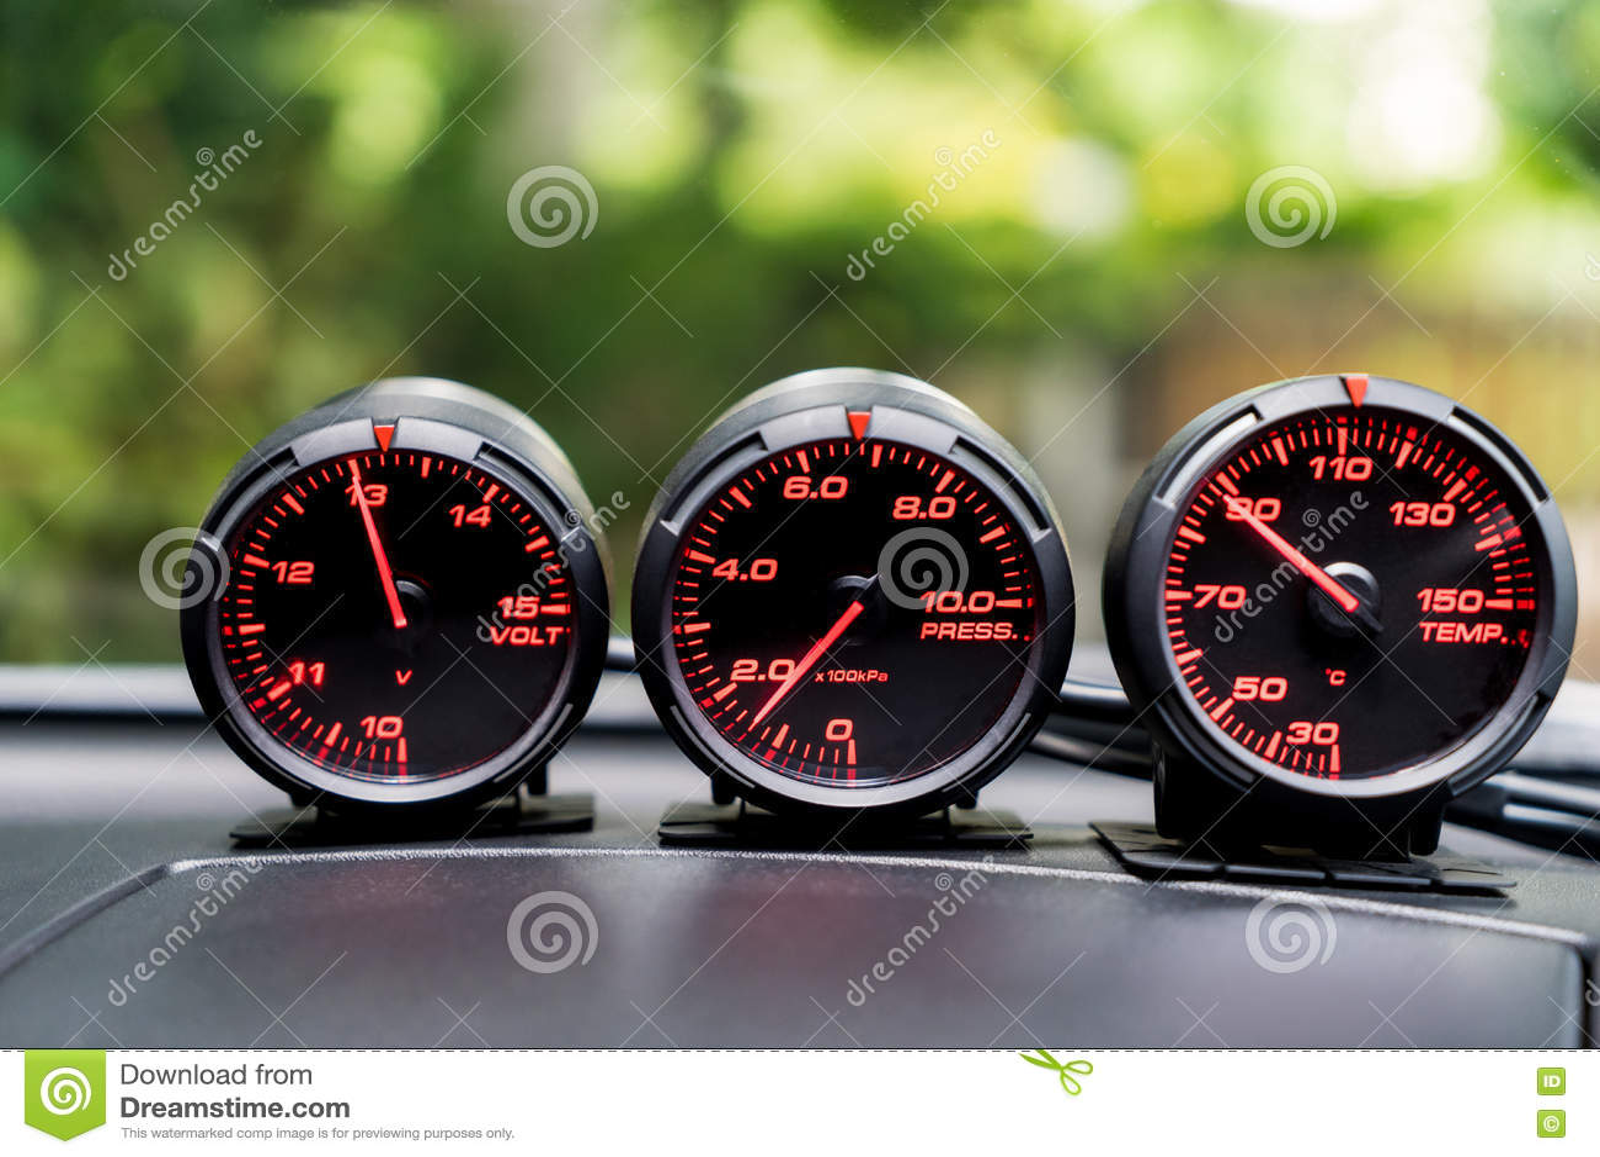 Car Sport Racing Gauge Meter On Car Console Stock Image Image Of